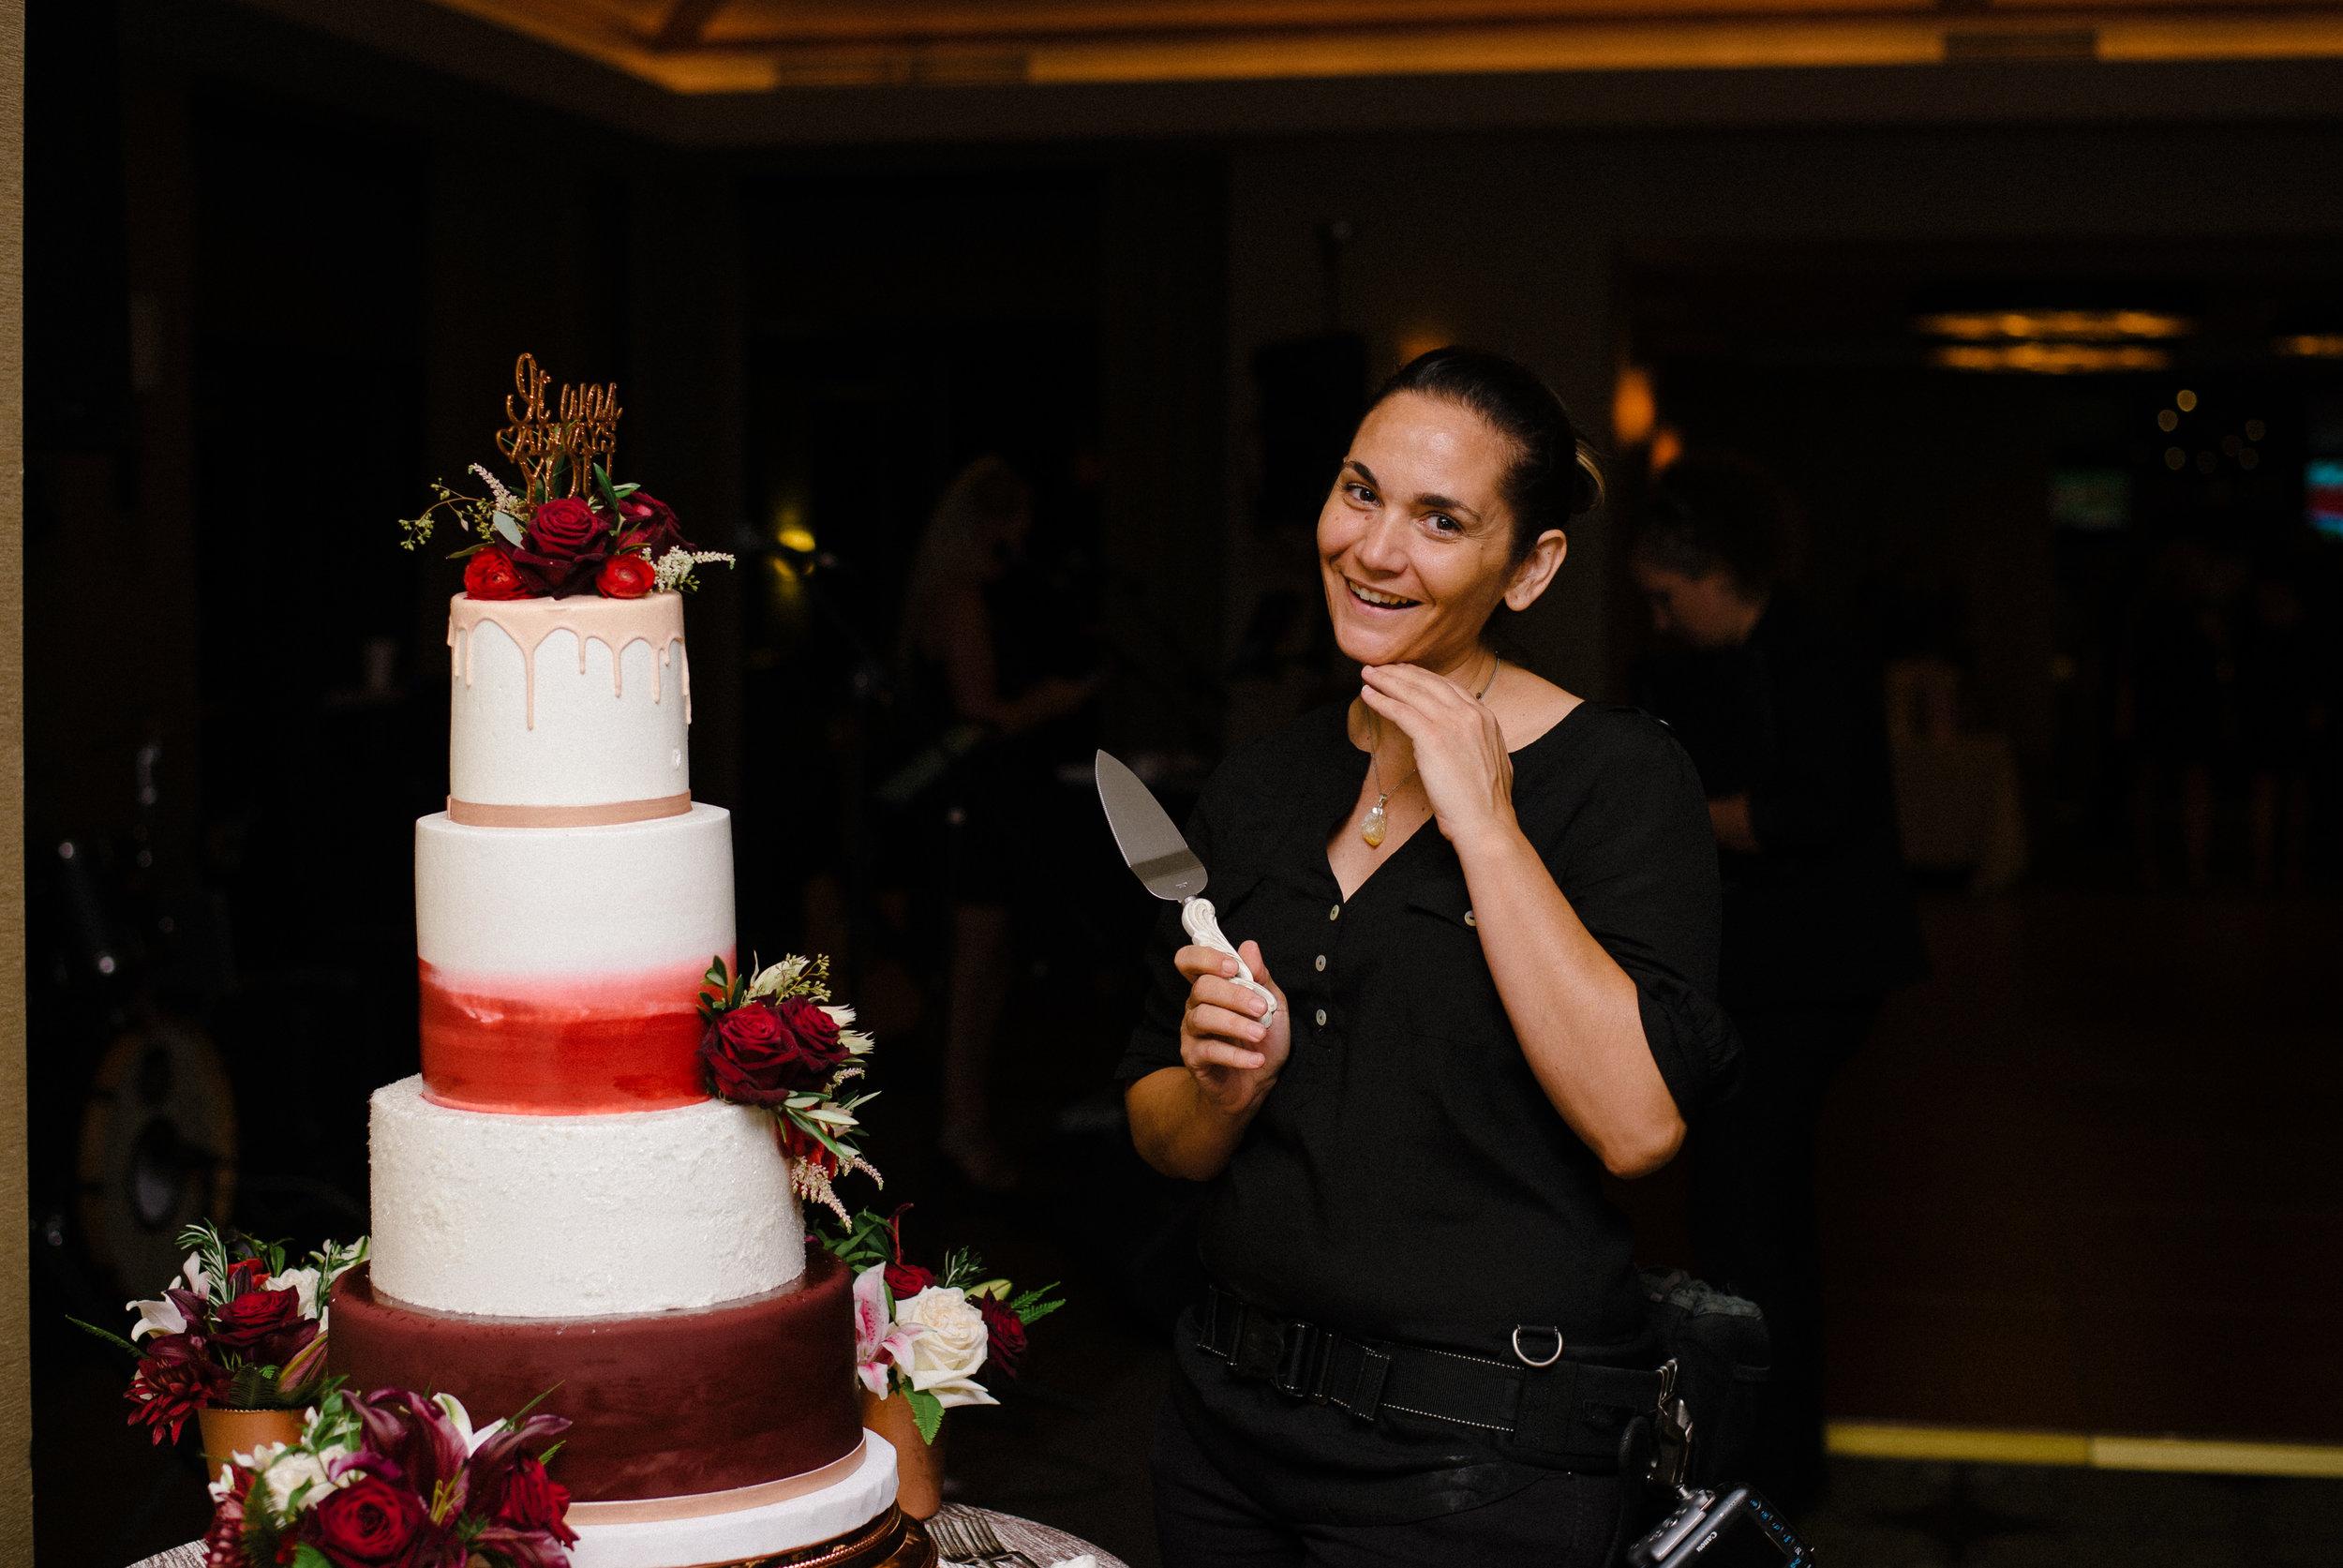 Awkward Wedding Photographer posing next to wedding cake